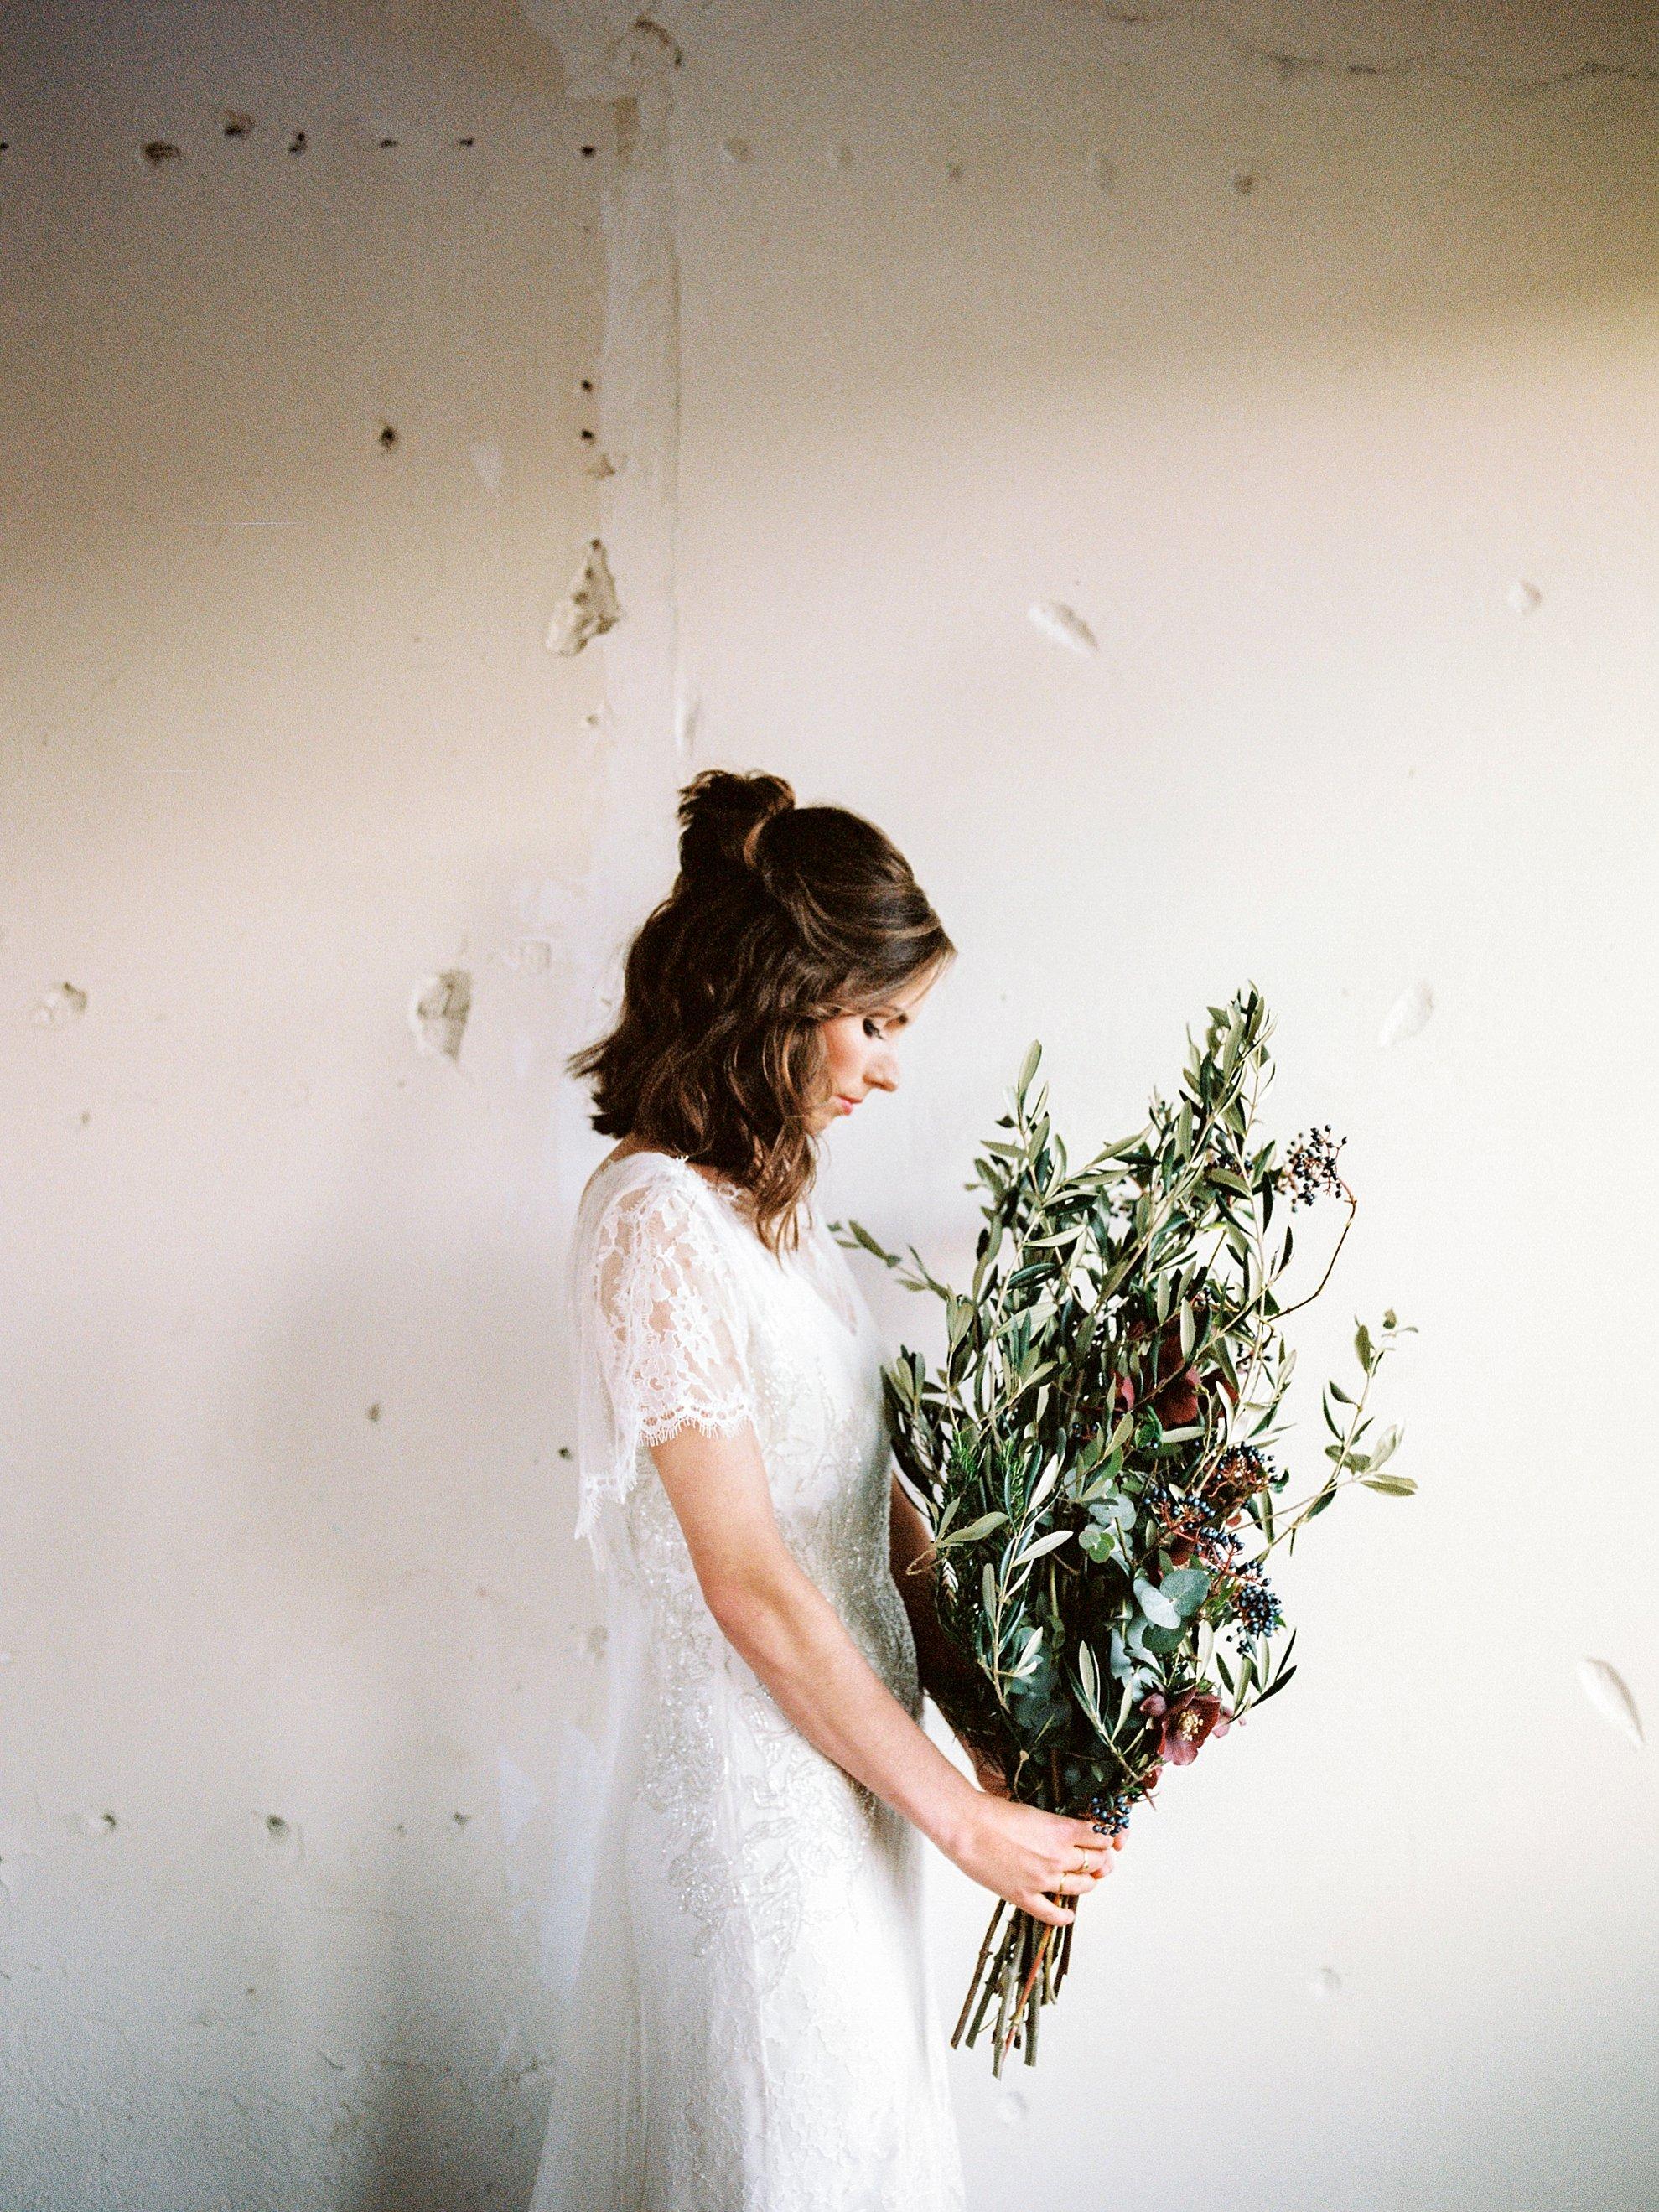 Amanda-Drost-fine-art-photography_0007.jpg